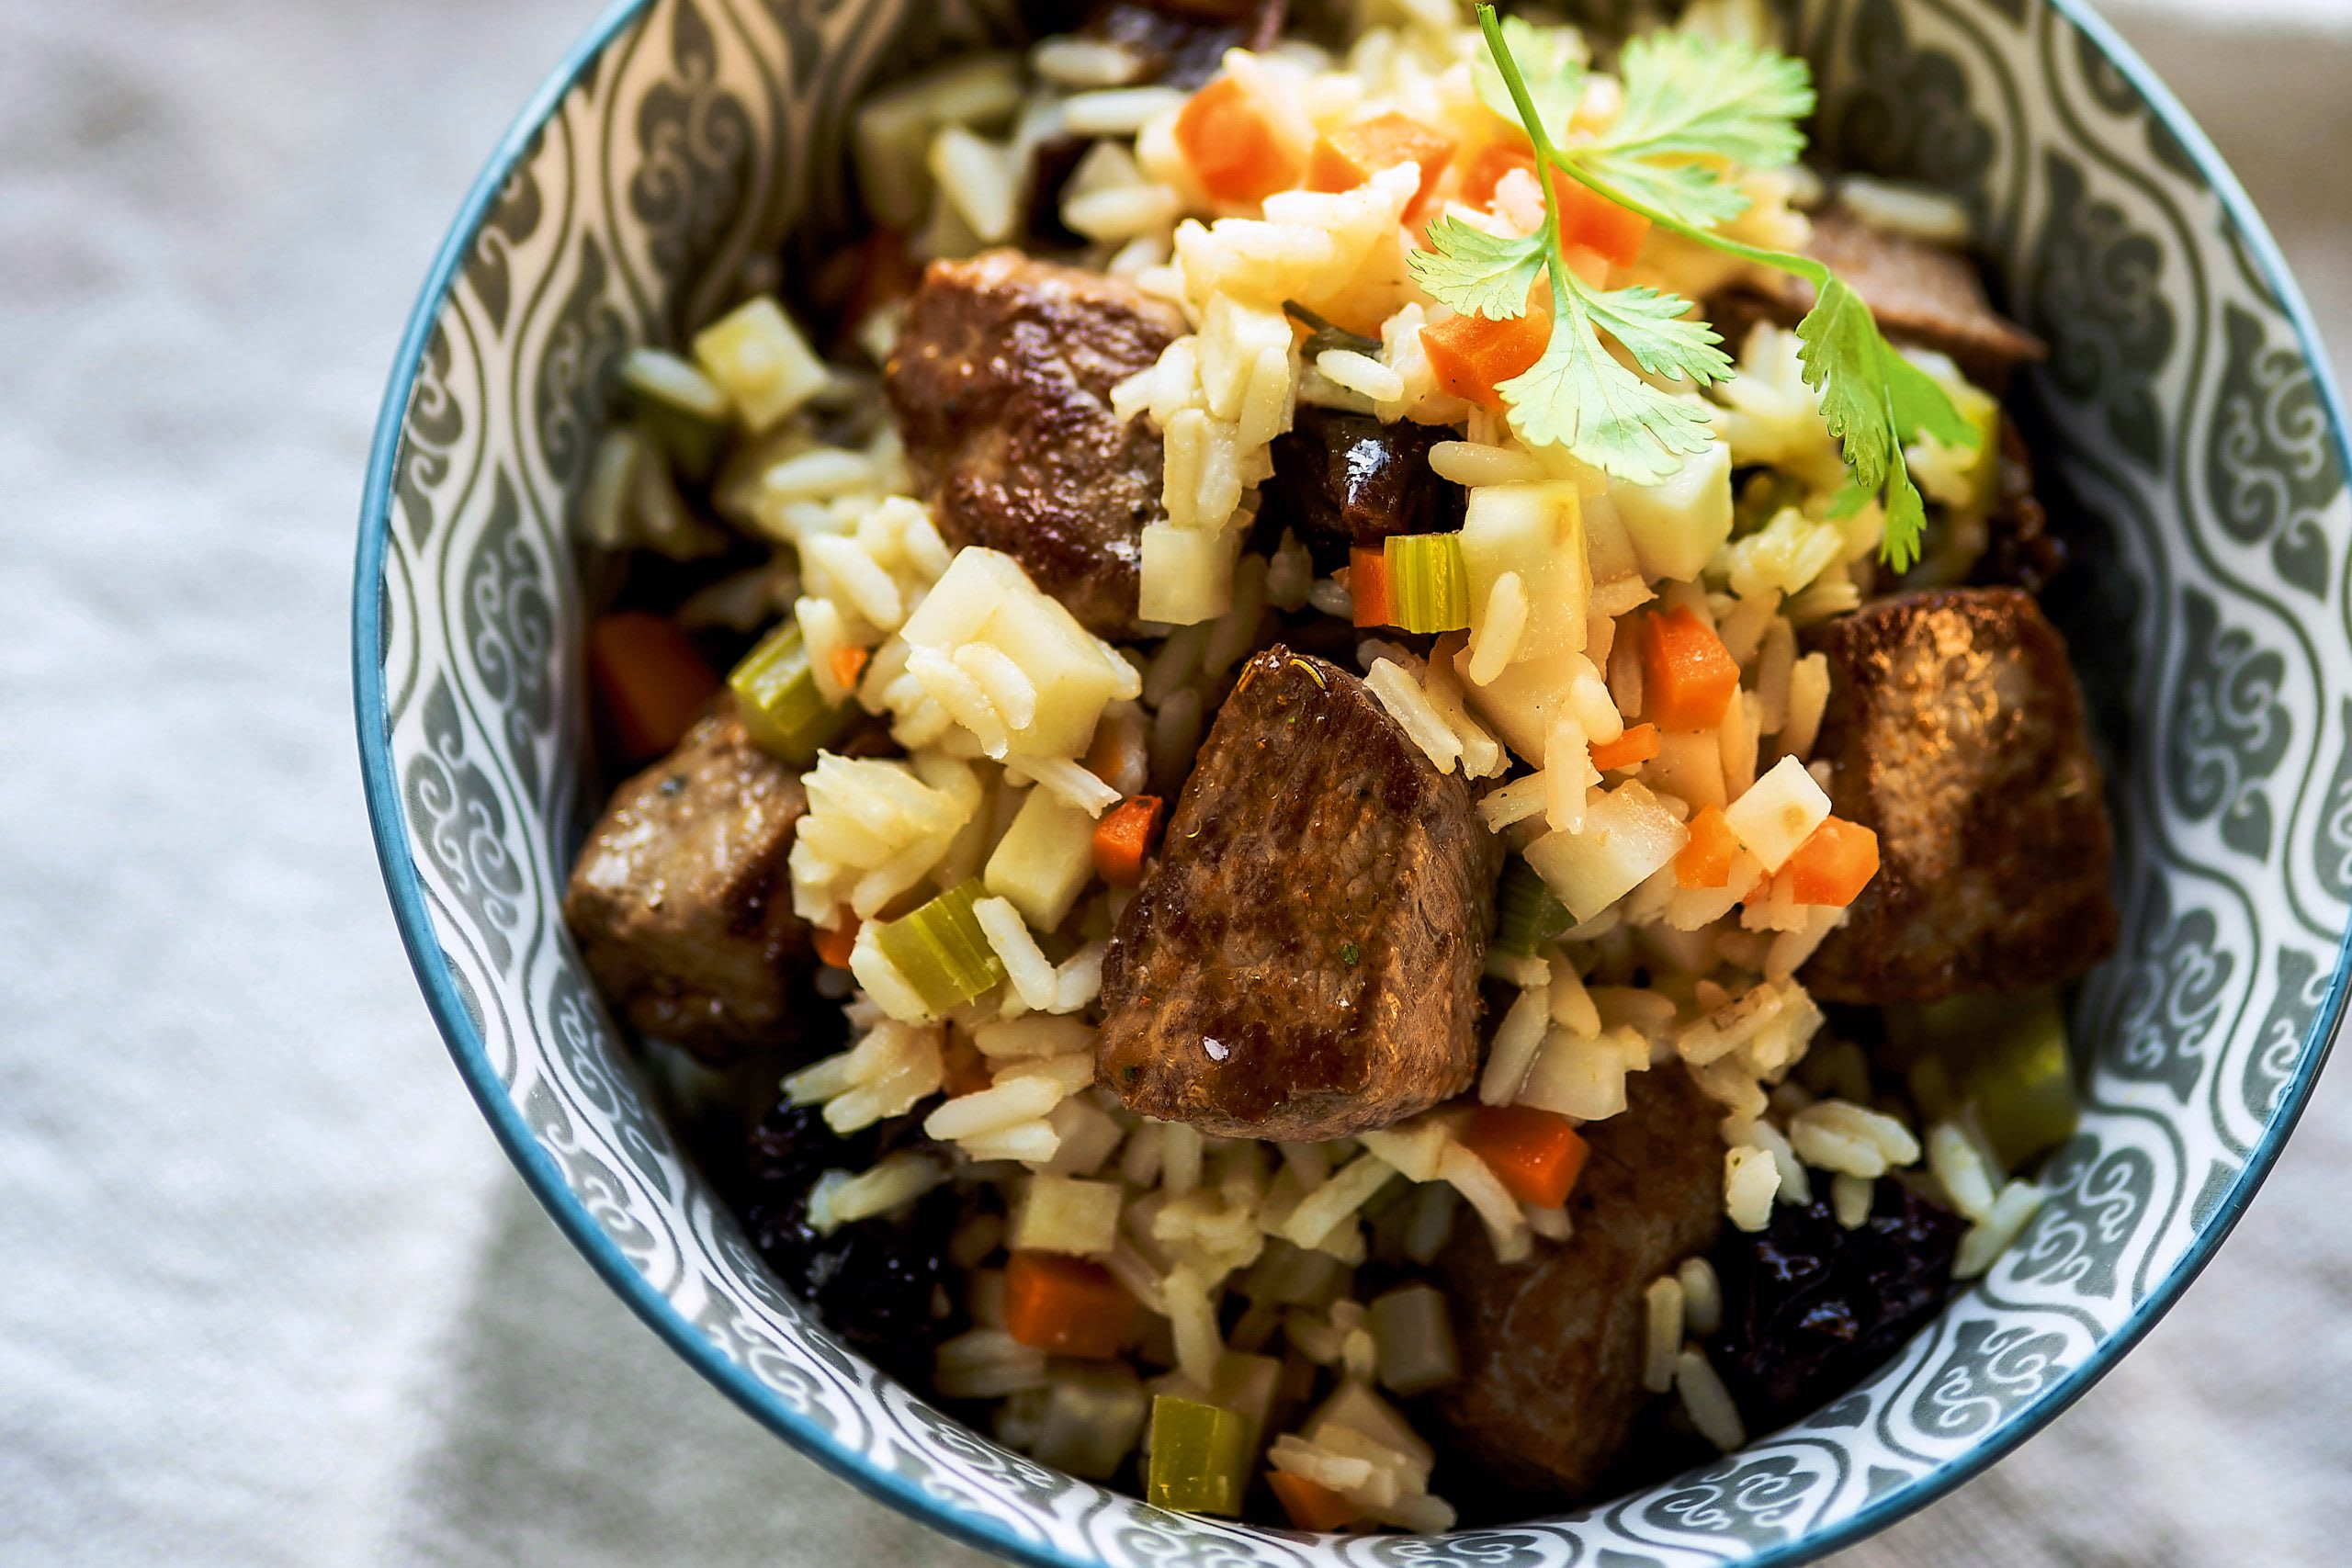 Ragoût d'agneau et riz